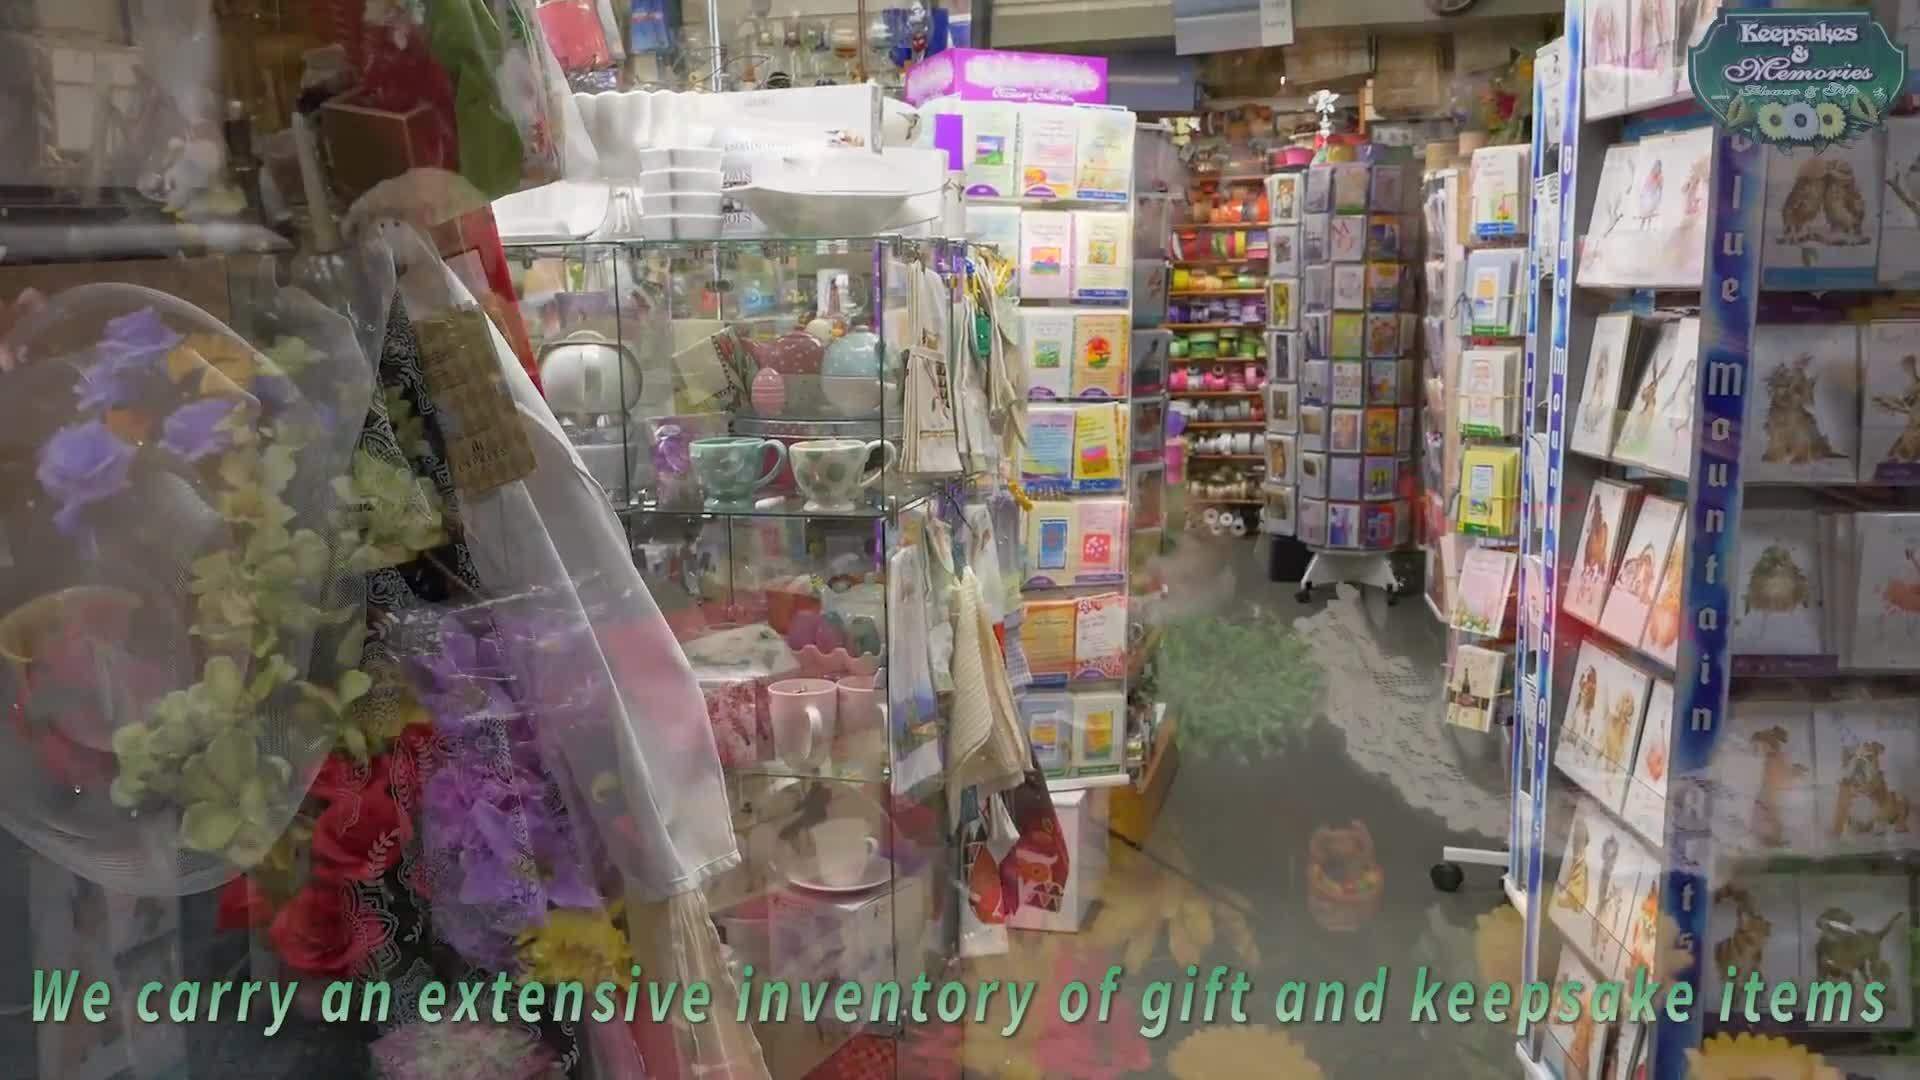 Keepsakes & Memories - Florists & Flower Shops - 519-832-5053